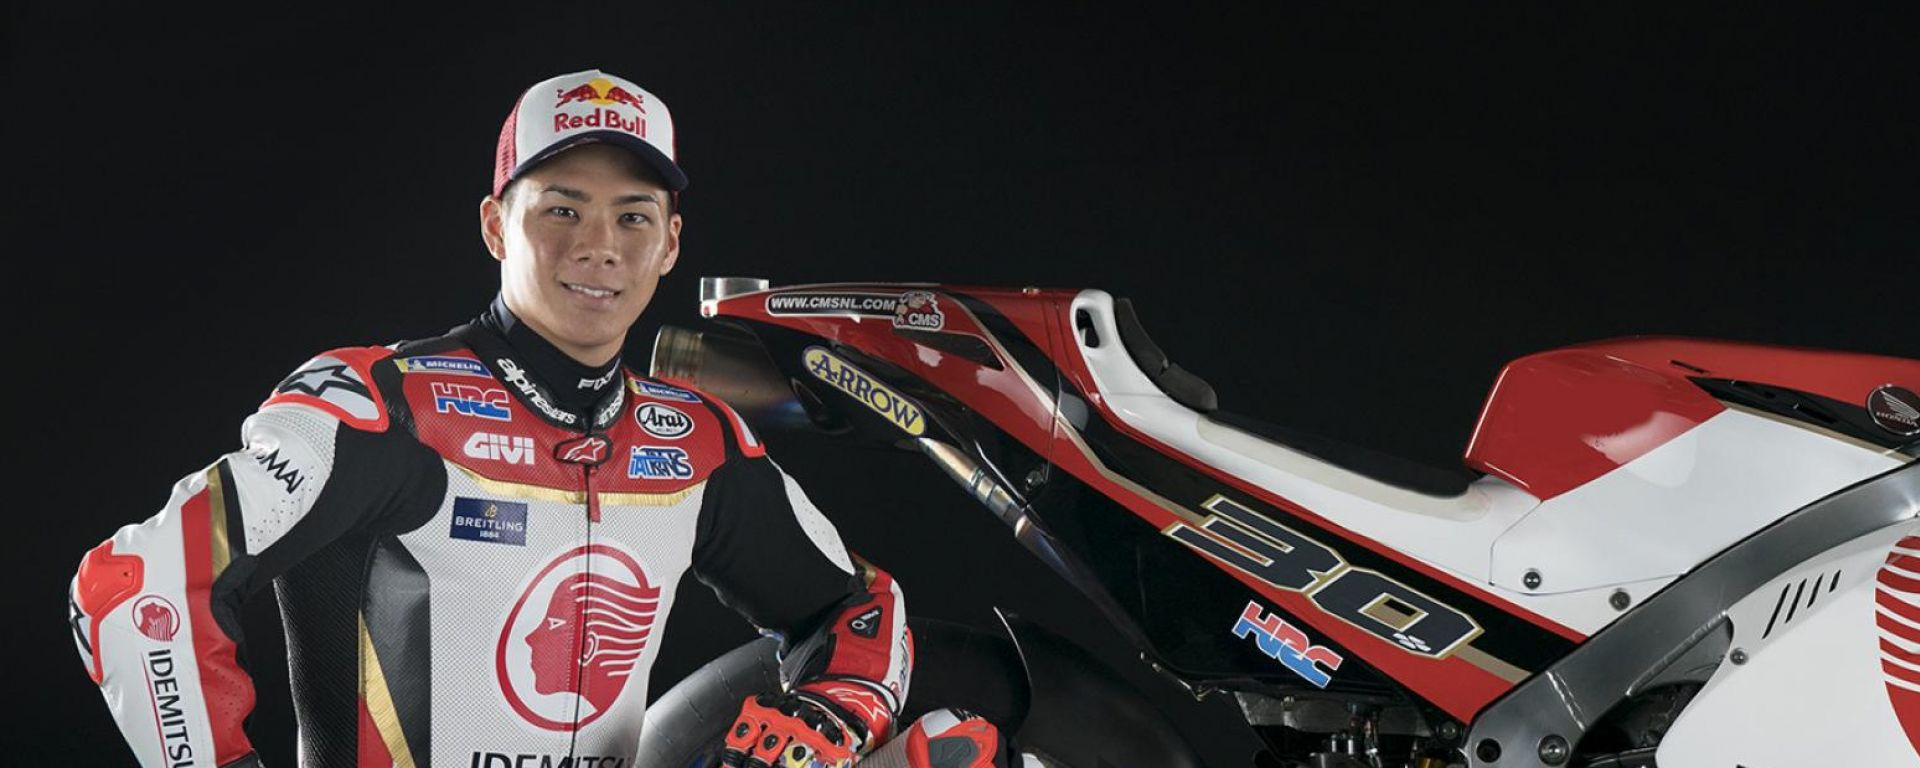 MotoGP 2019, Takaaki Nakagami - LCR Honda Idemitsu